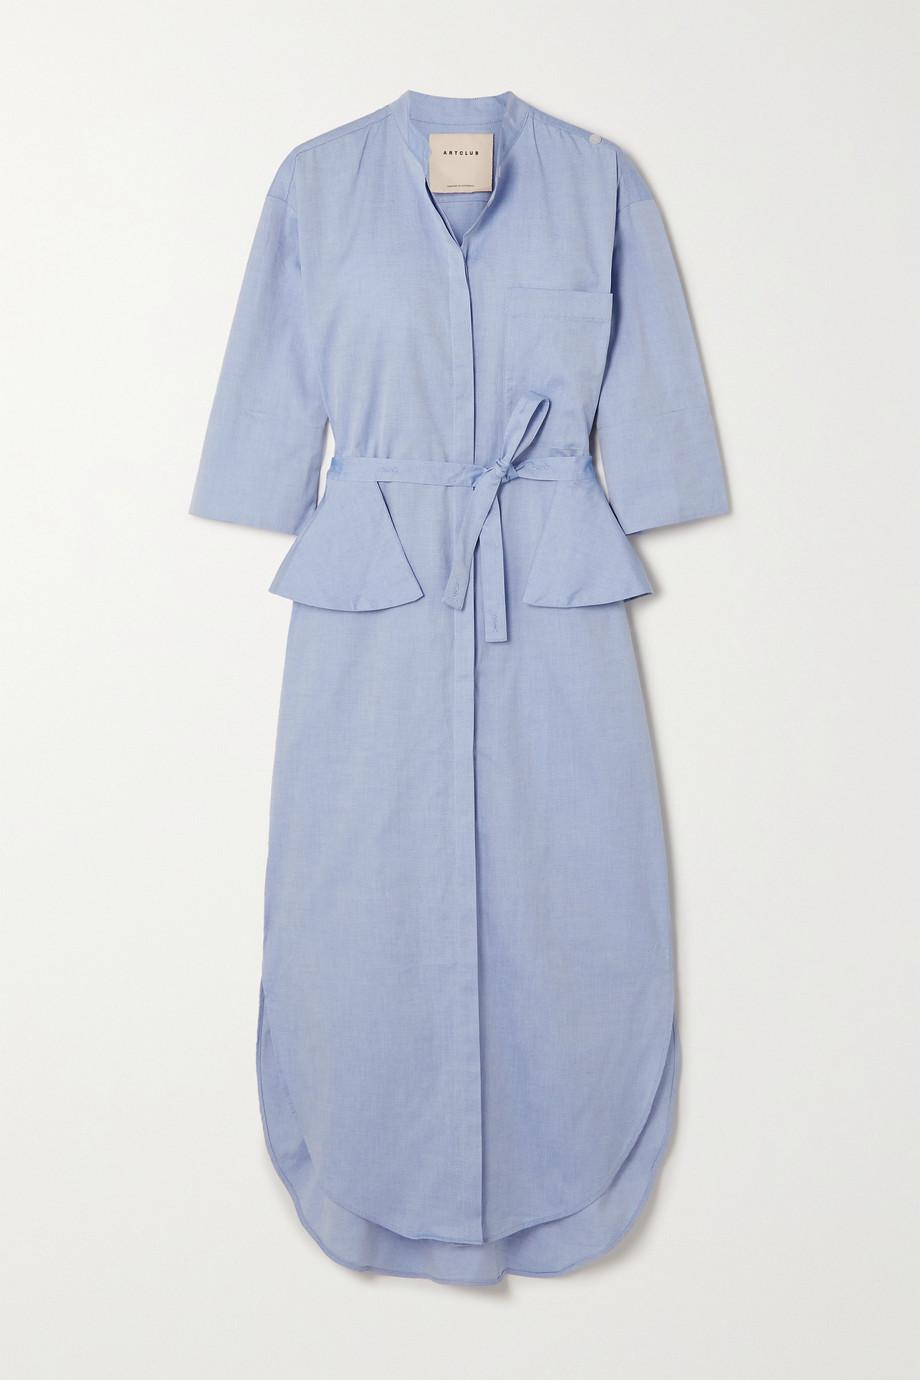 ARTCLUB + NET SUSTAIN Florican belted cotton midi shirt dress